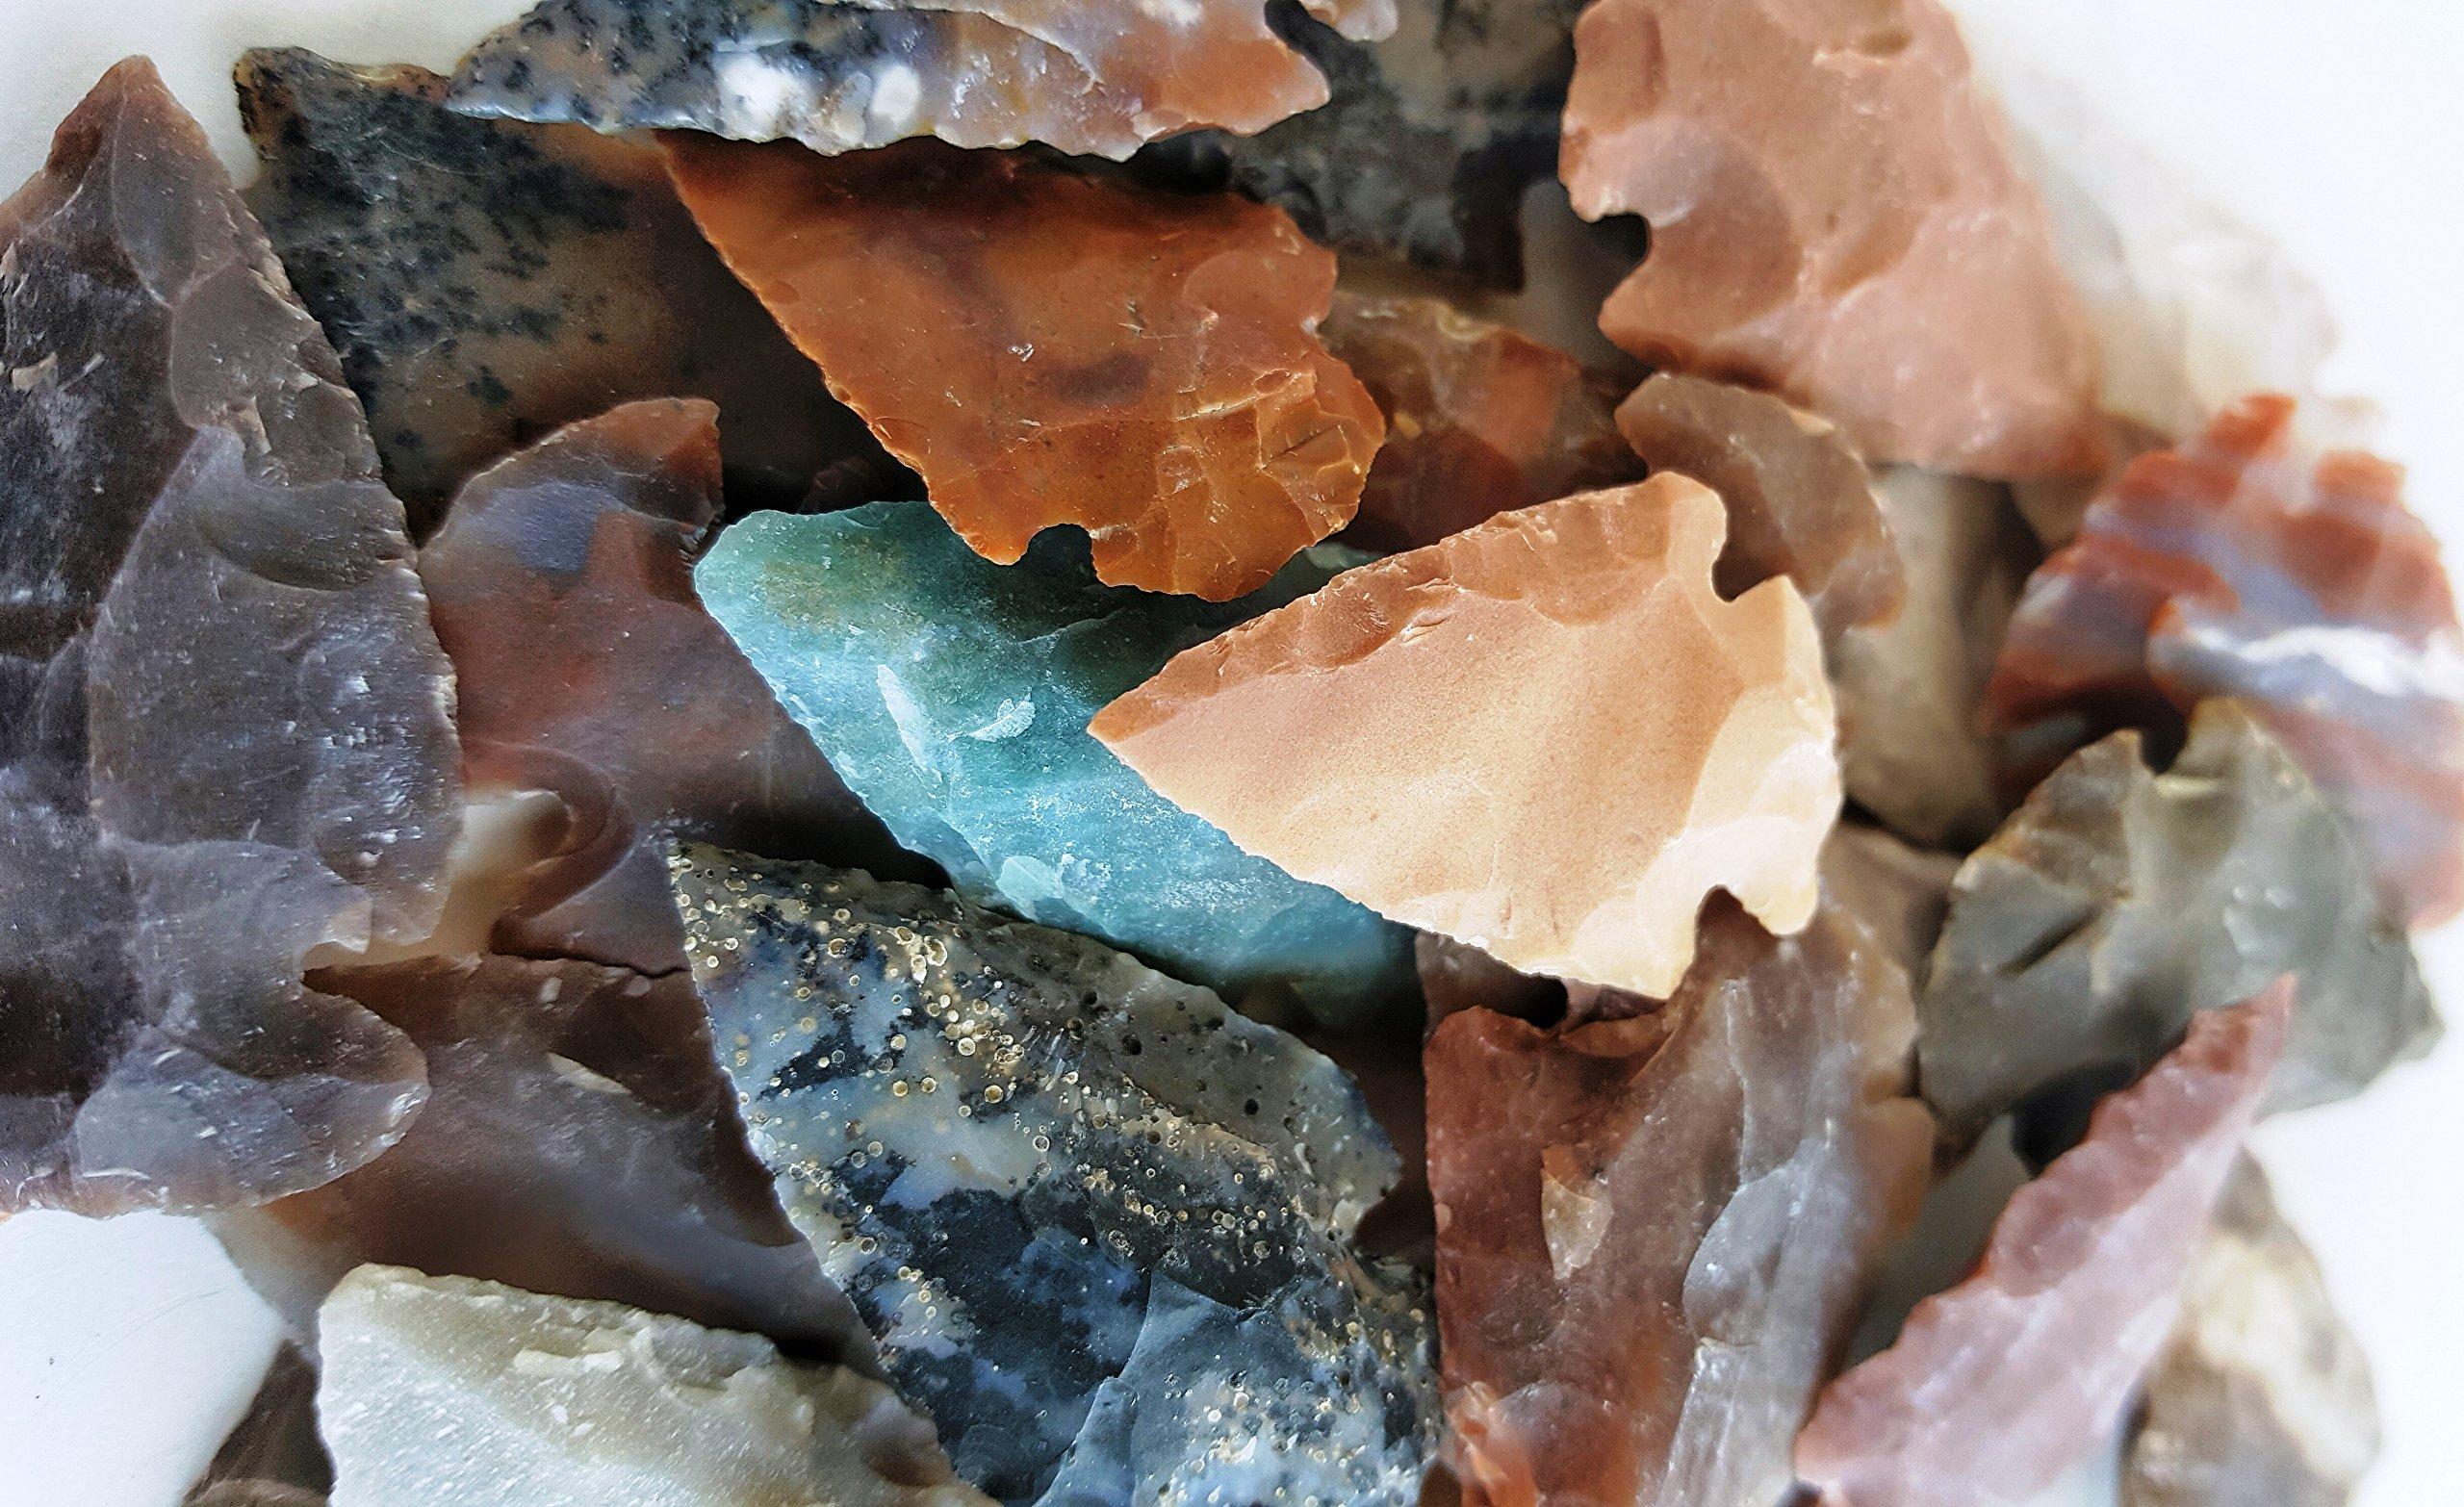 Arrowhead Lot, 32 pcs Indian Agate Stone Arrowhead Set by Ashkii by Arrowheads by Ashkii (Image #3)